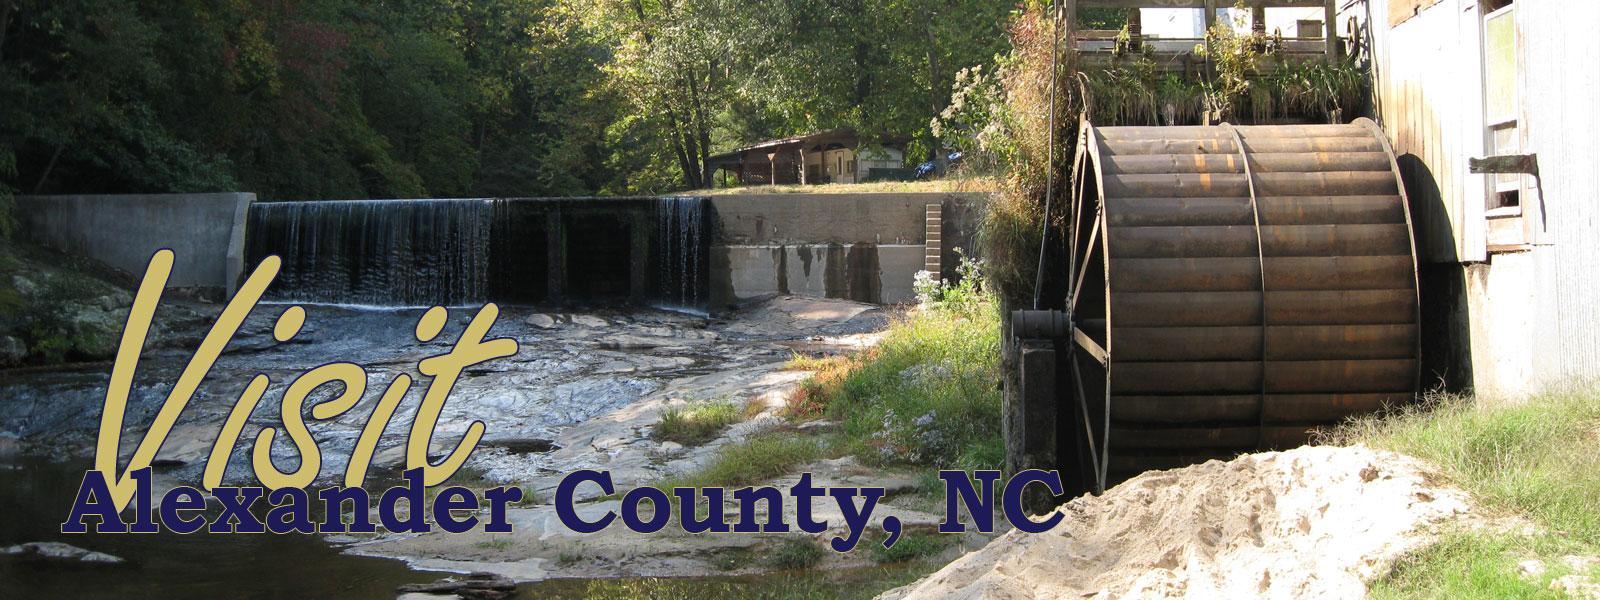 Visit Alexander County, NC